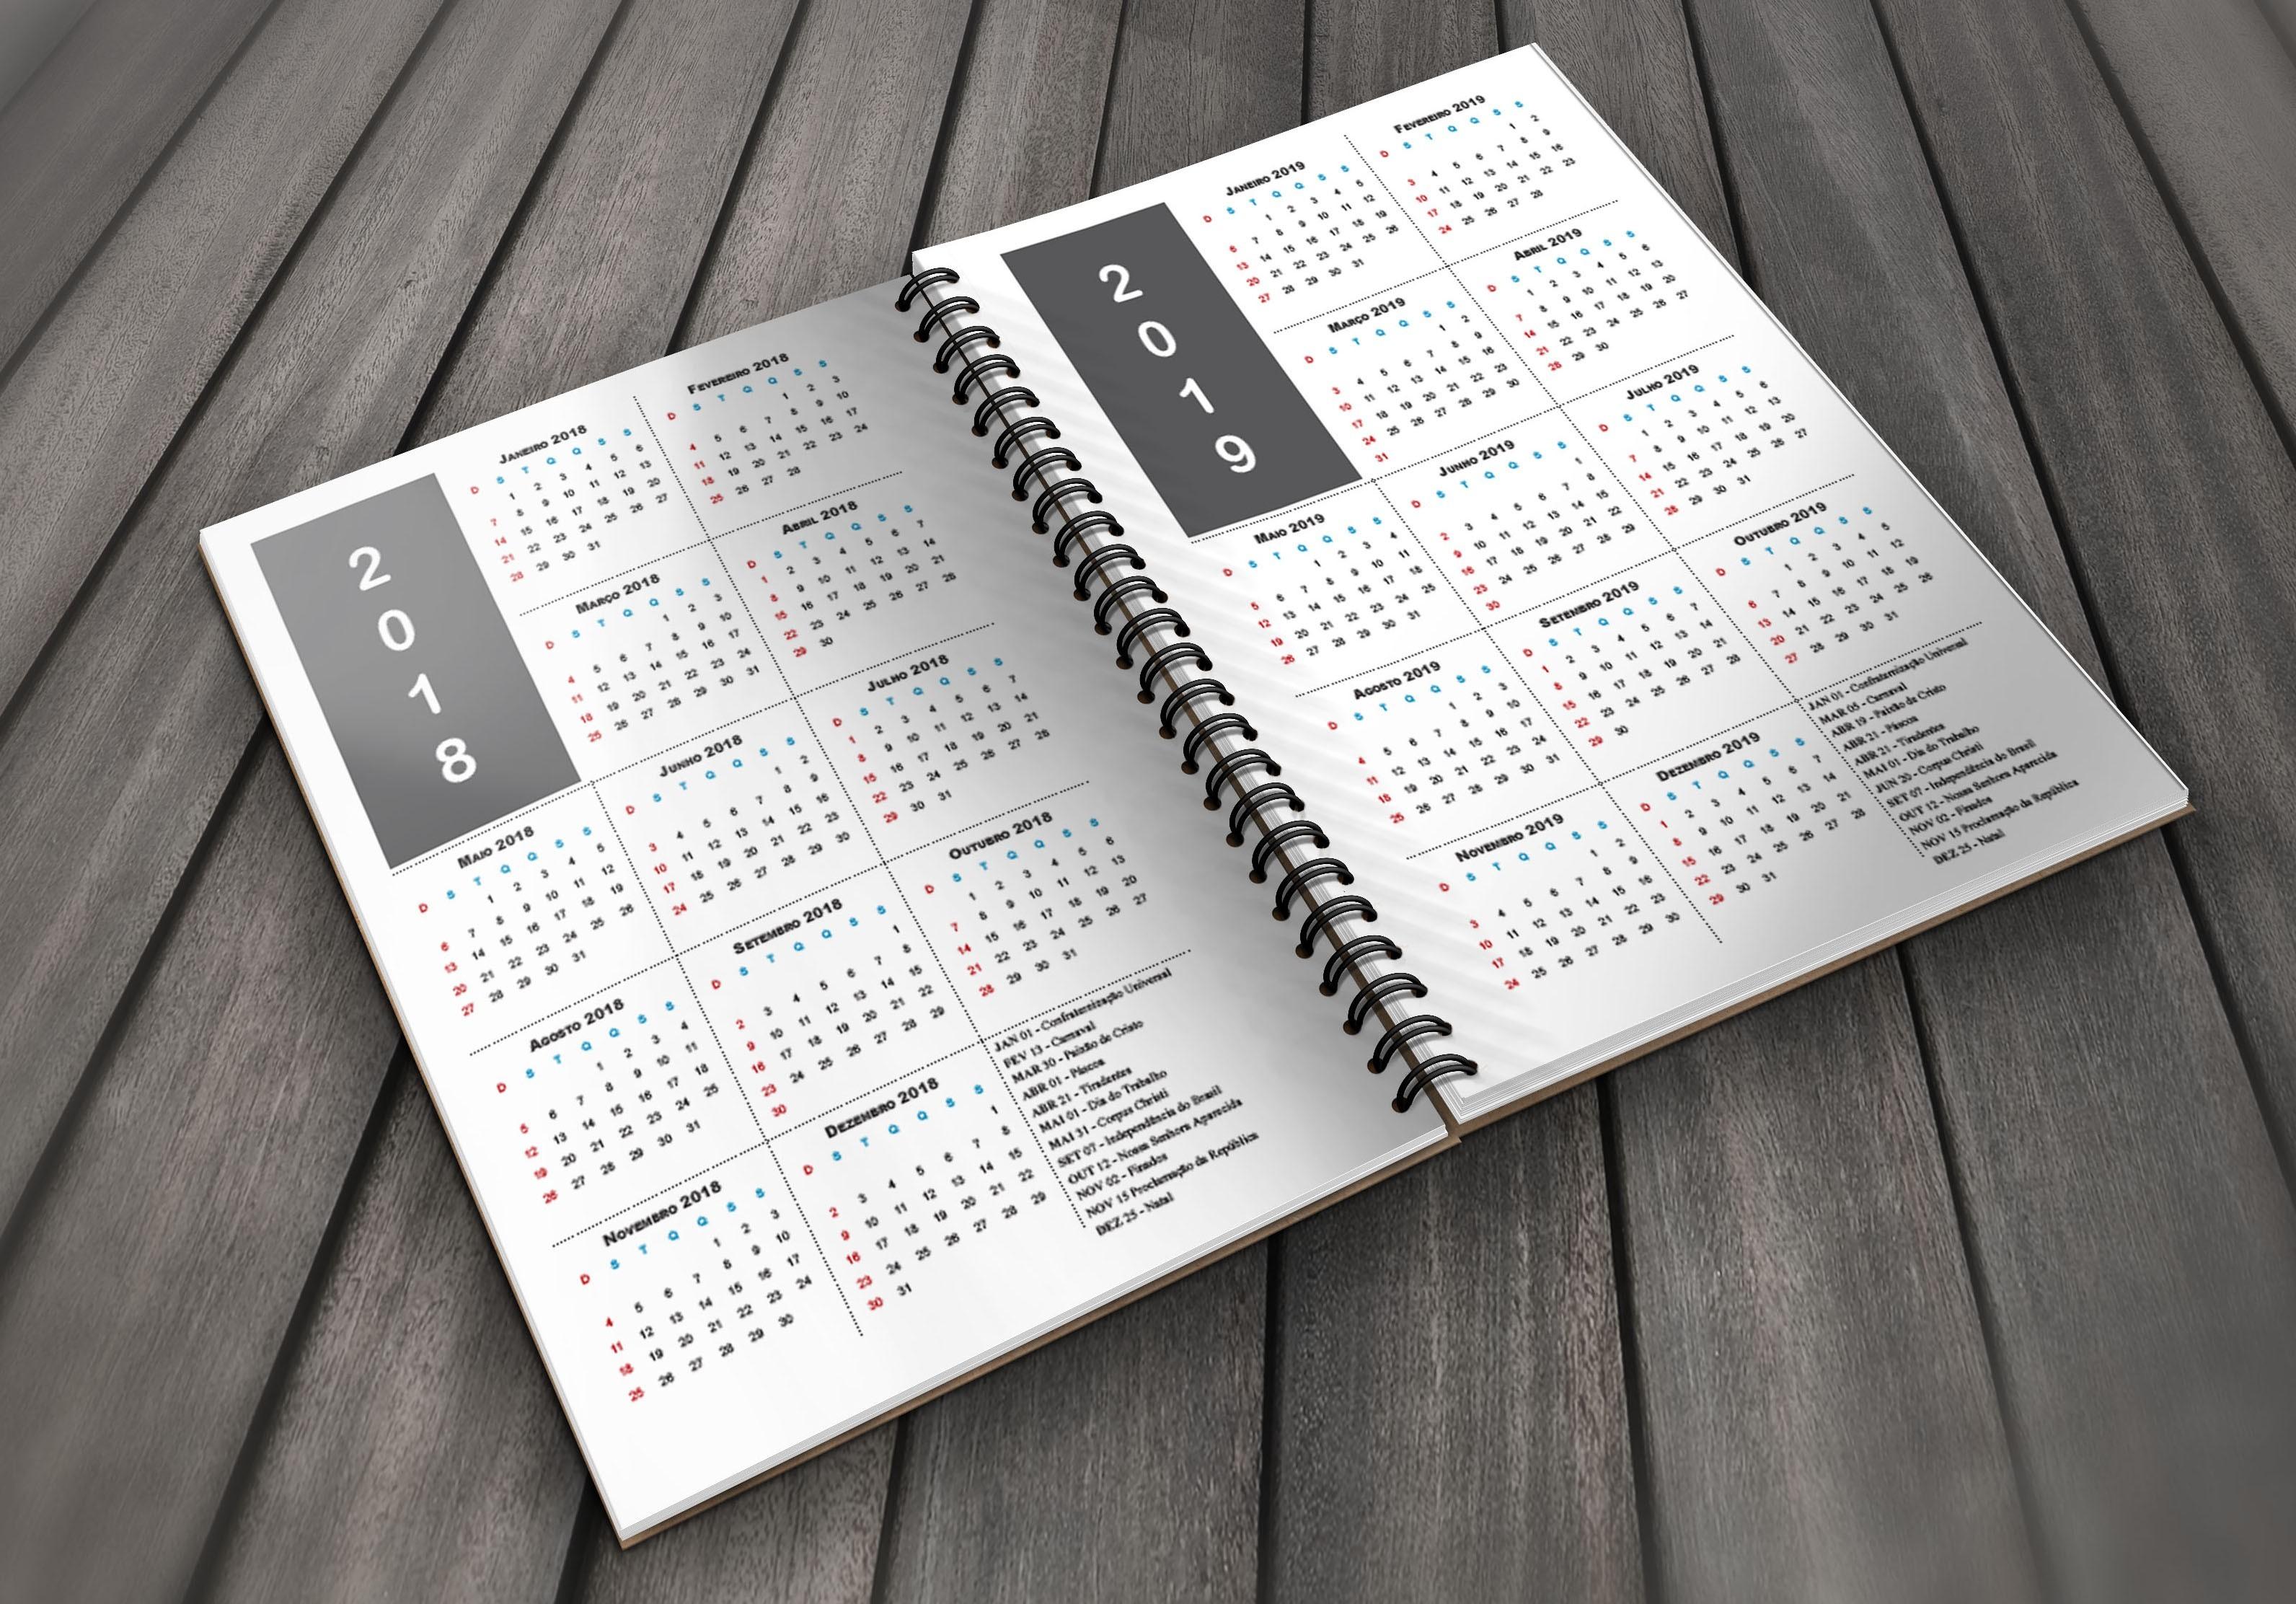 miolo agenda 2018 pdf 1 dia por pagina psd smartobject Miolo Agenda 2018 para Imprimir procedente de calendario de escritorio 2019